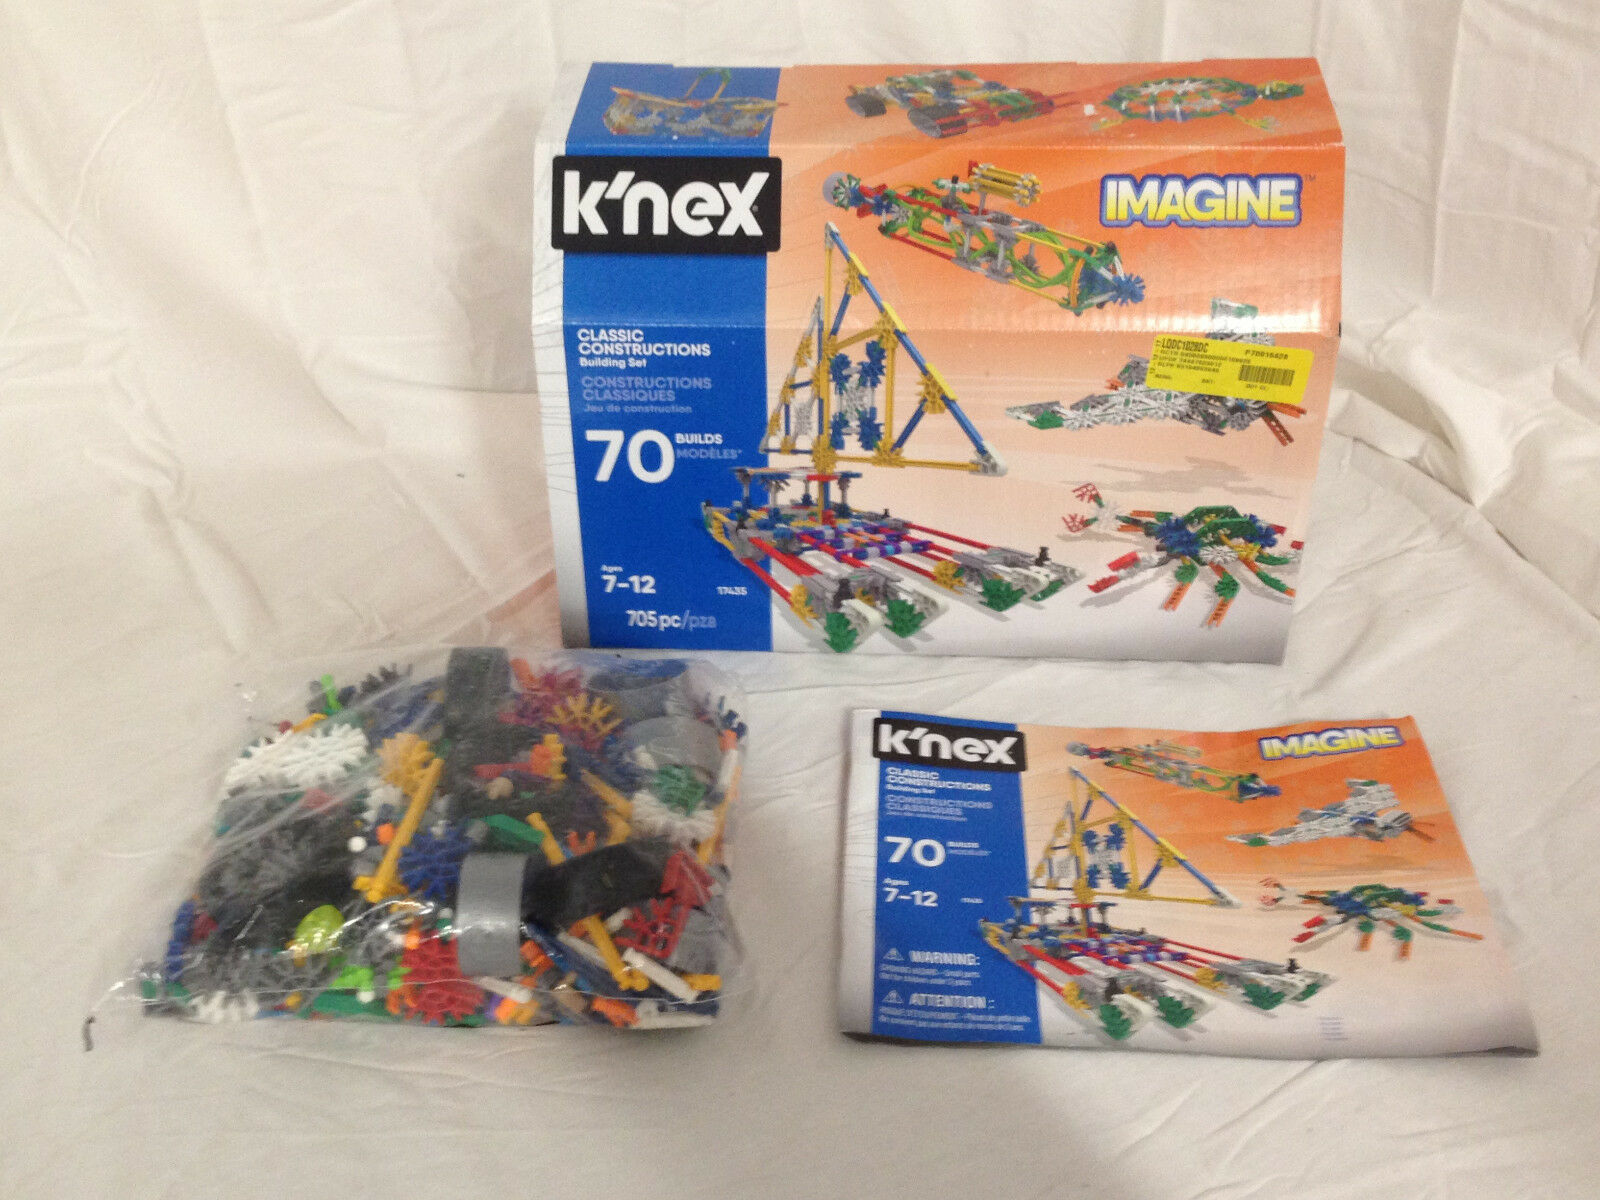 K'Nex Classic Constructions Building Set - 705 pieces - New